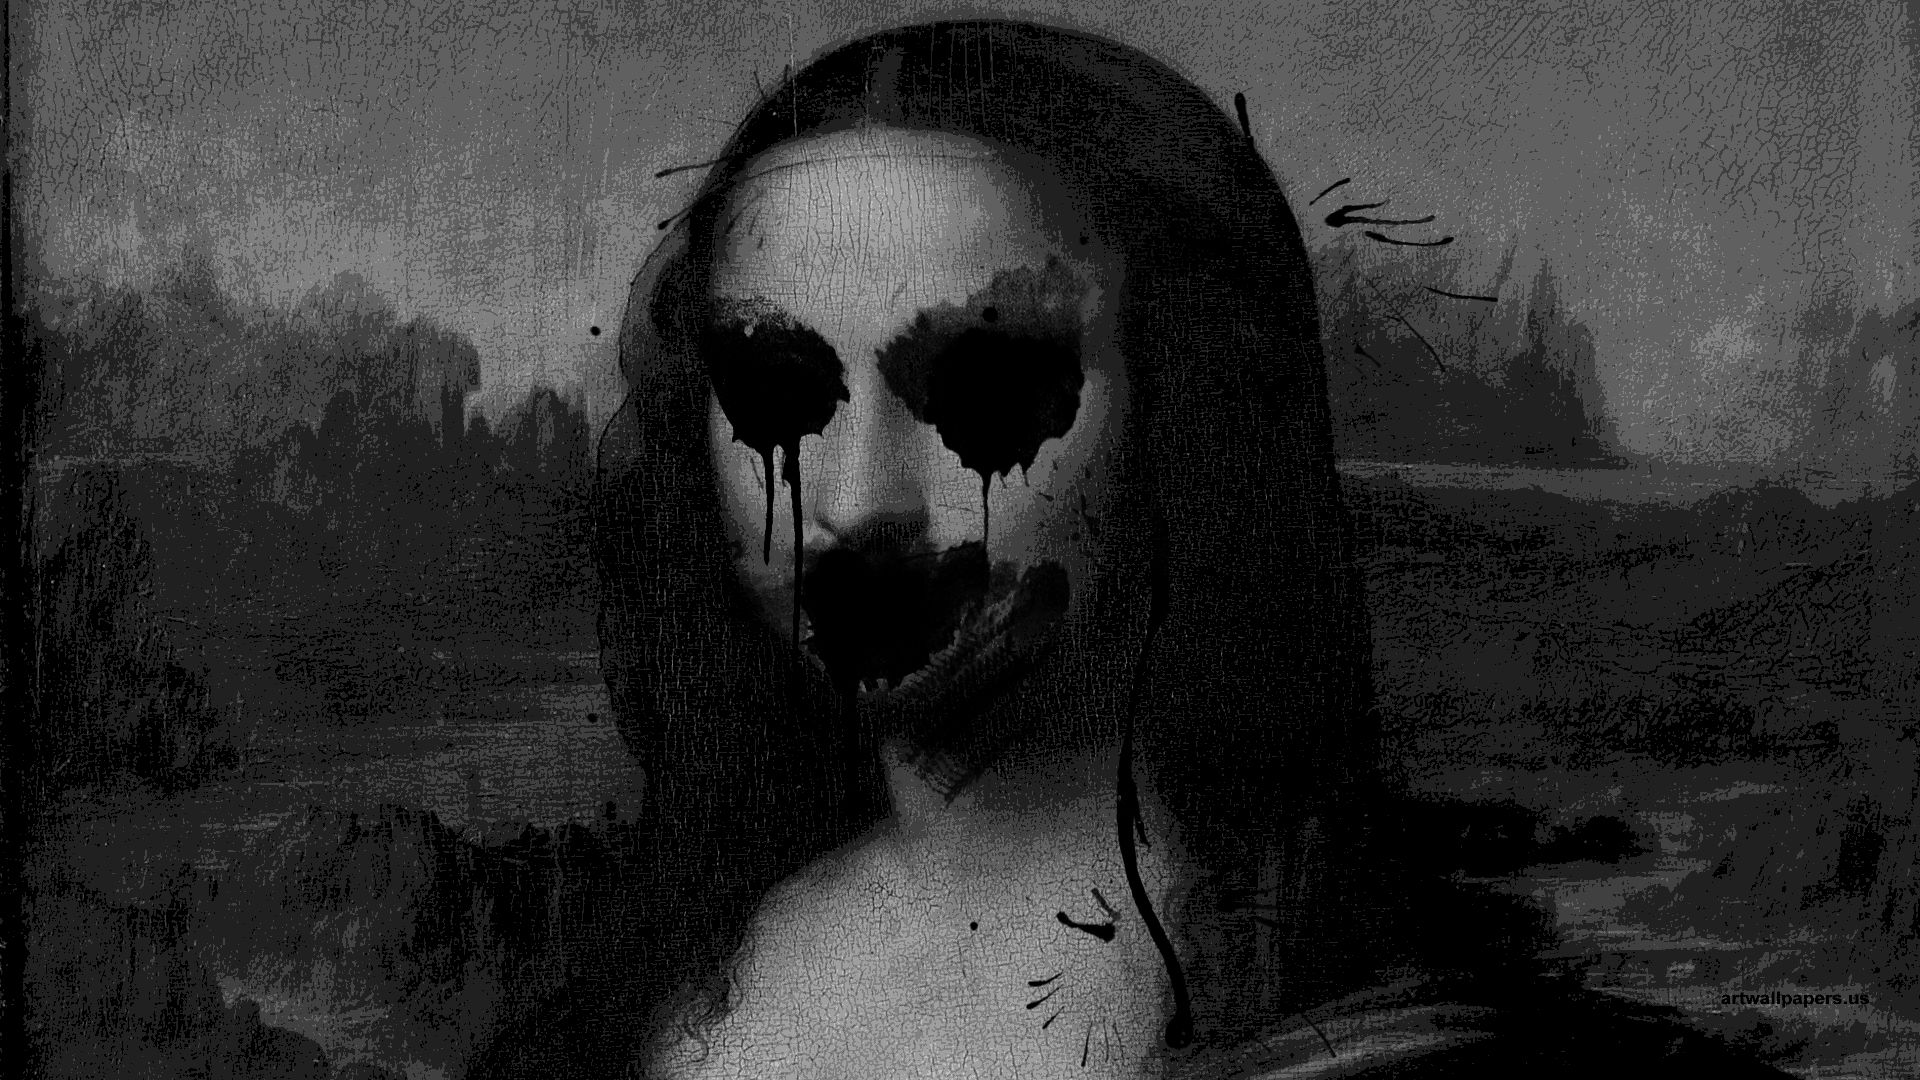 Creepy Art Home Browse All Creepy Mona Lisa Scary